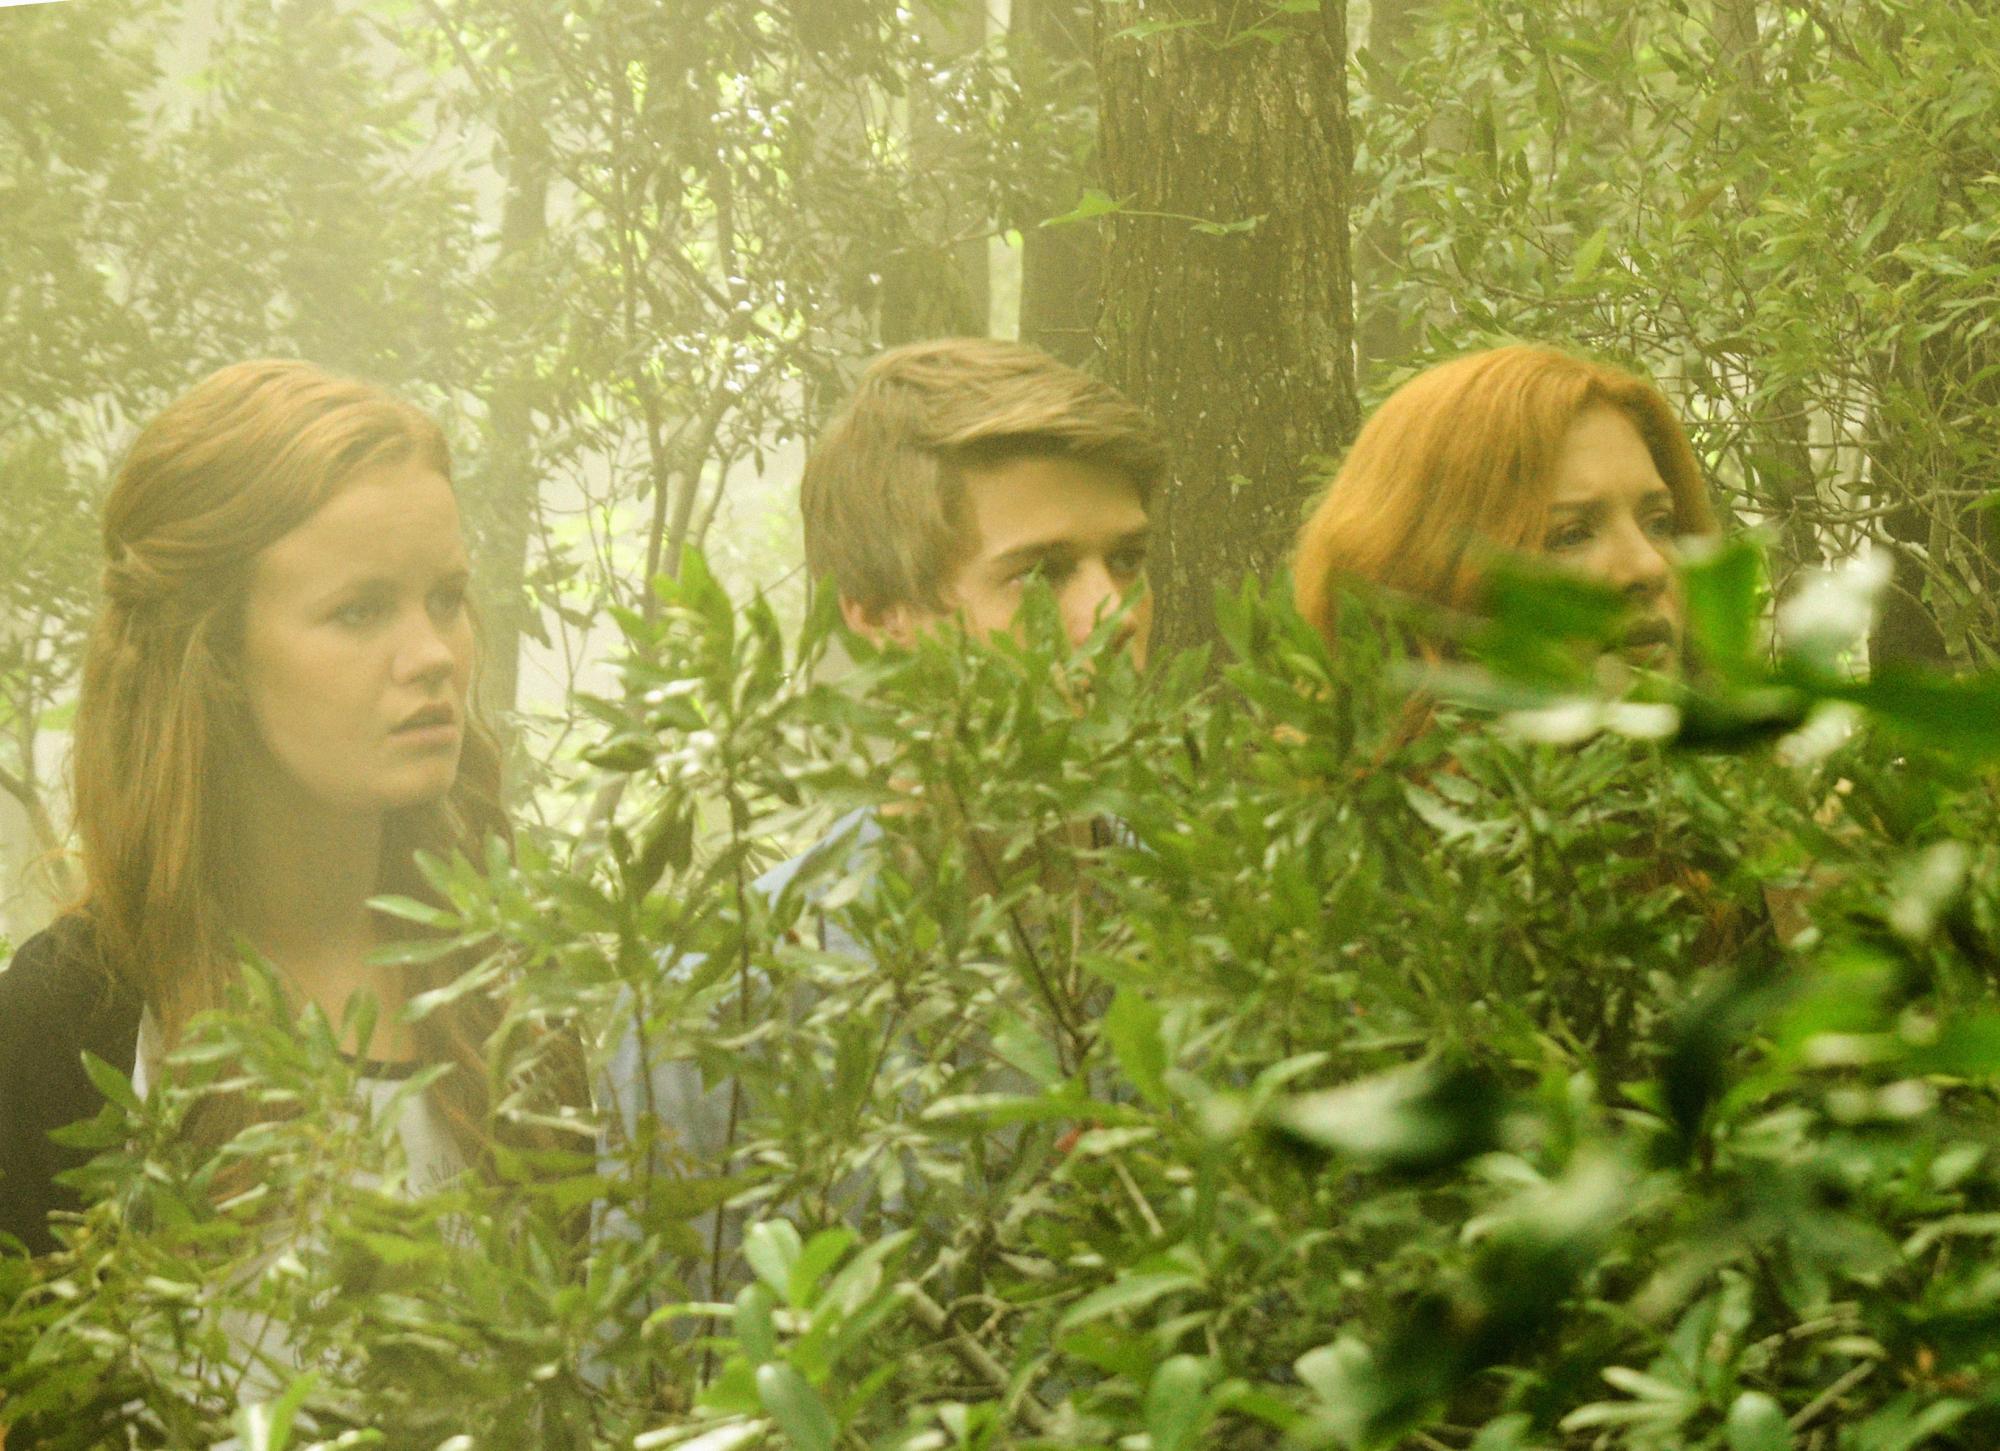 Mackenzie Lintz as Norrie Calvert-Hill, Colin Ford as Joe McAlister, and Rachelle Lefevre as Julia Shumway.